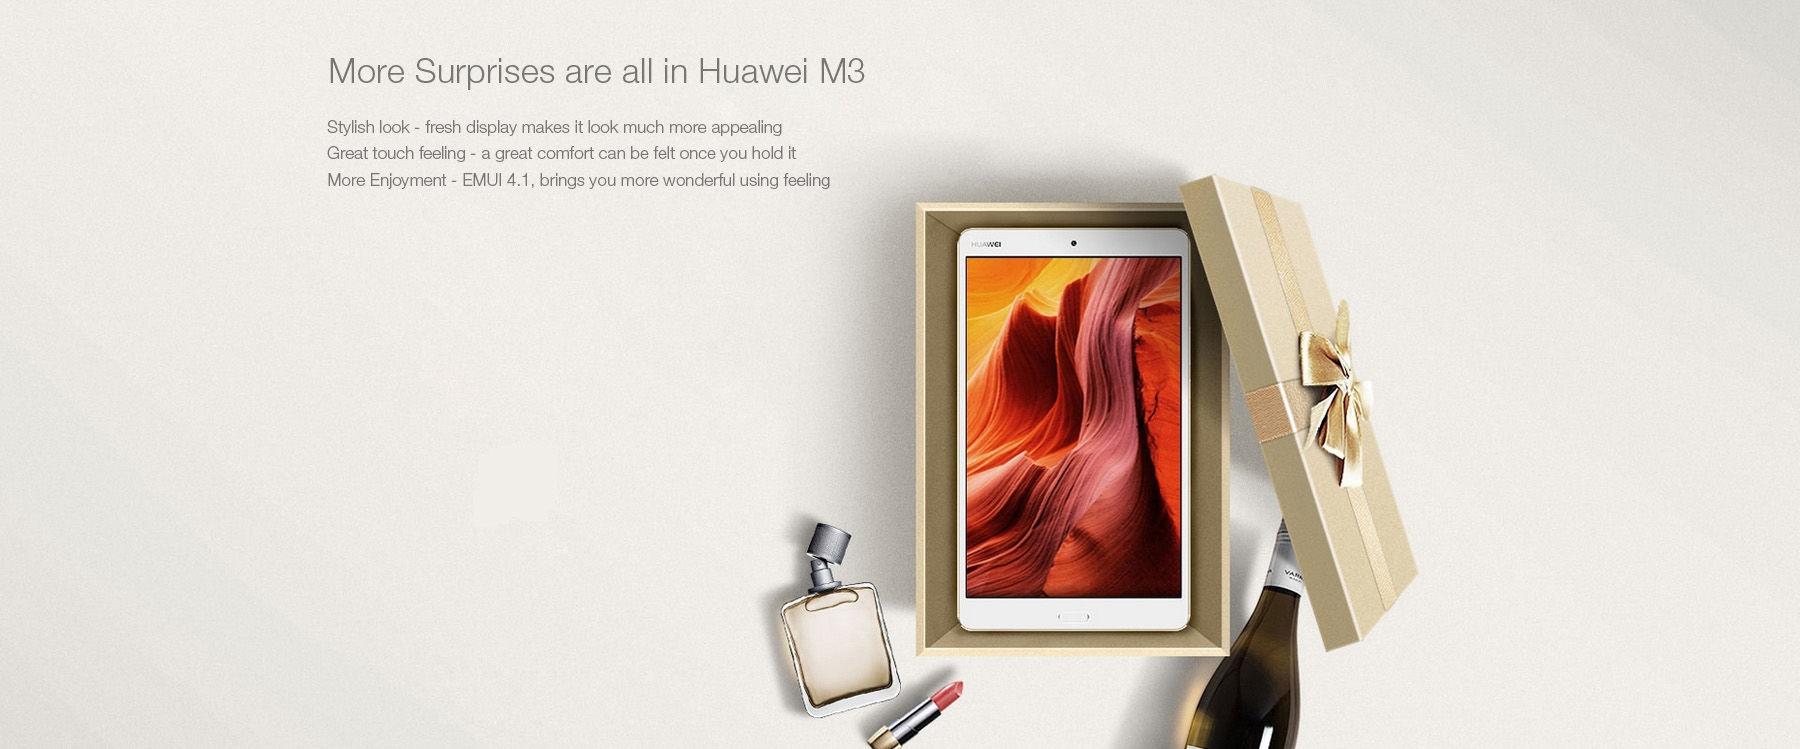 Huawei M3 ( BTV-DL09 ) 4G Phablet 8.4 inch Android 6.0 Kirin 950 Octa Core 2.3GHz 4GB RAM 32GB ROM  2K IPS Screen Fingerprint Sensor Dual WiFi OTG